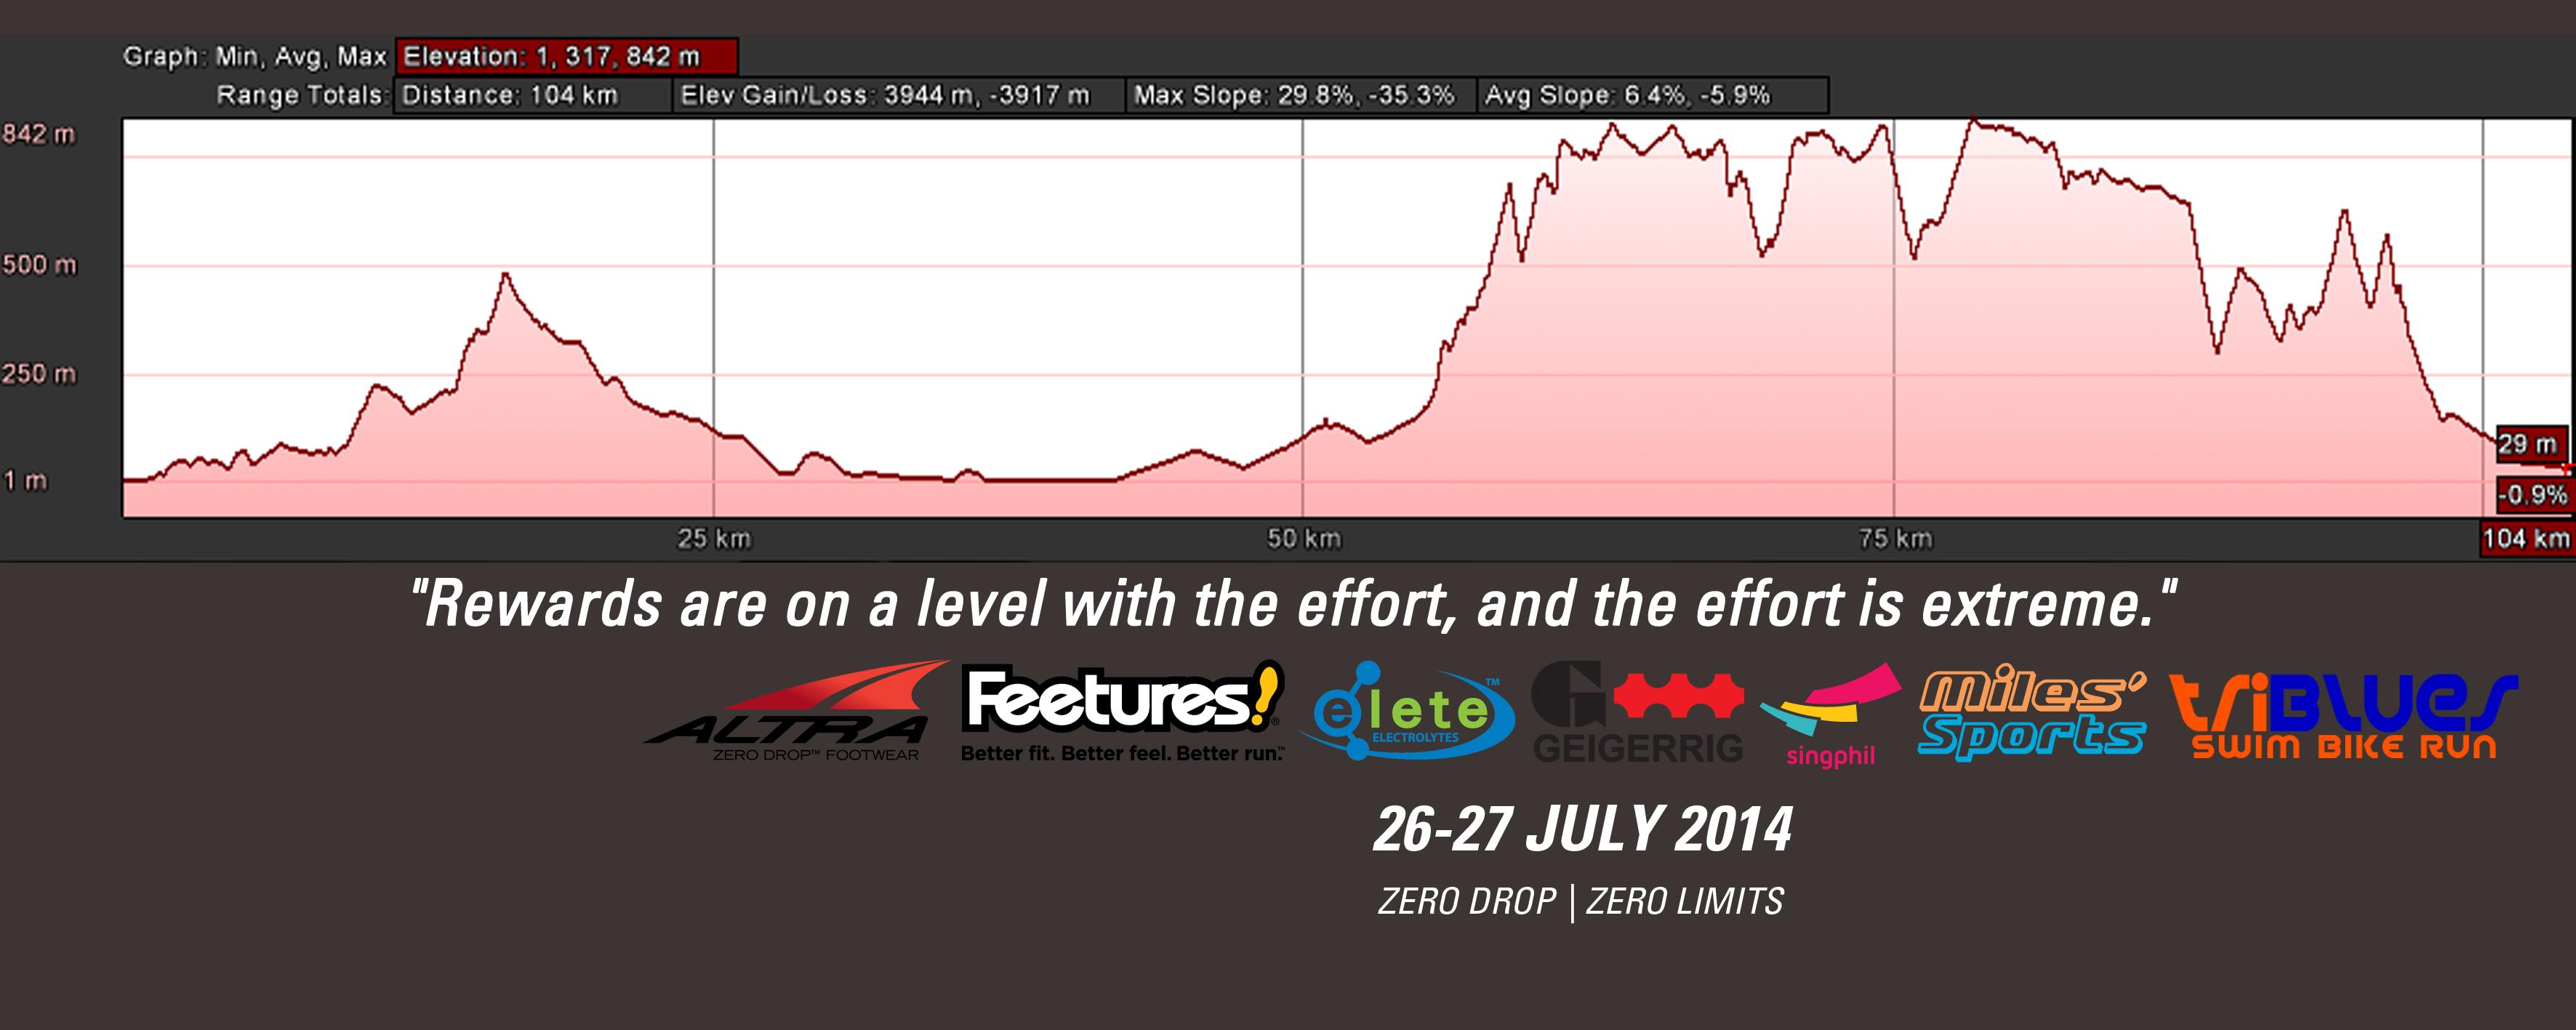 transcebu-ultramarathon-2014-poster2